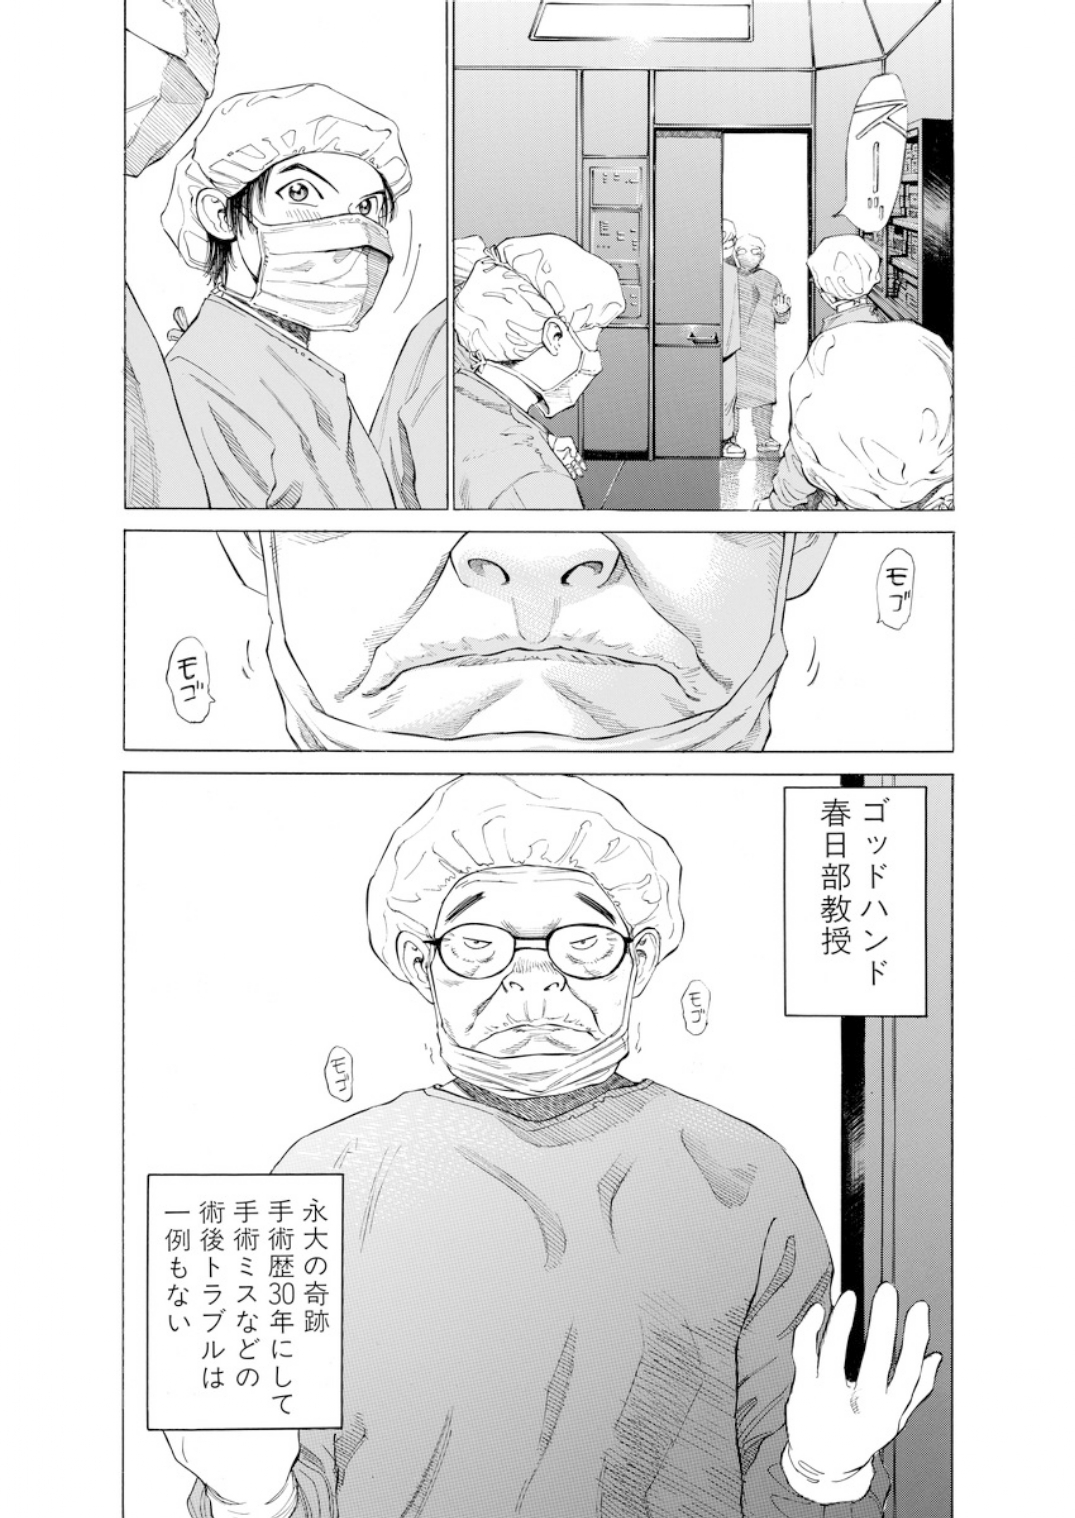 001bj_page-0070.jpg